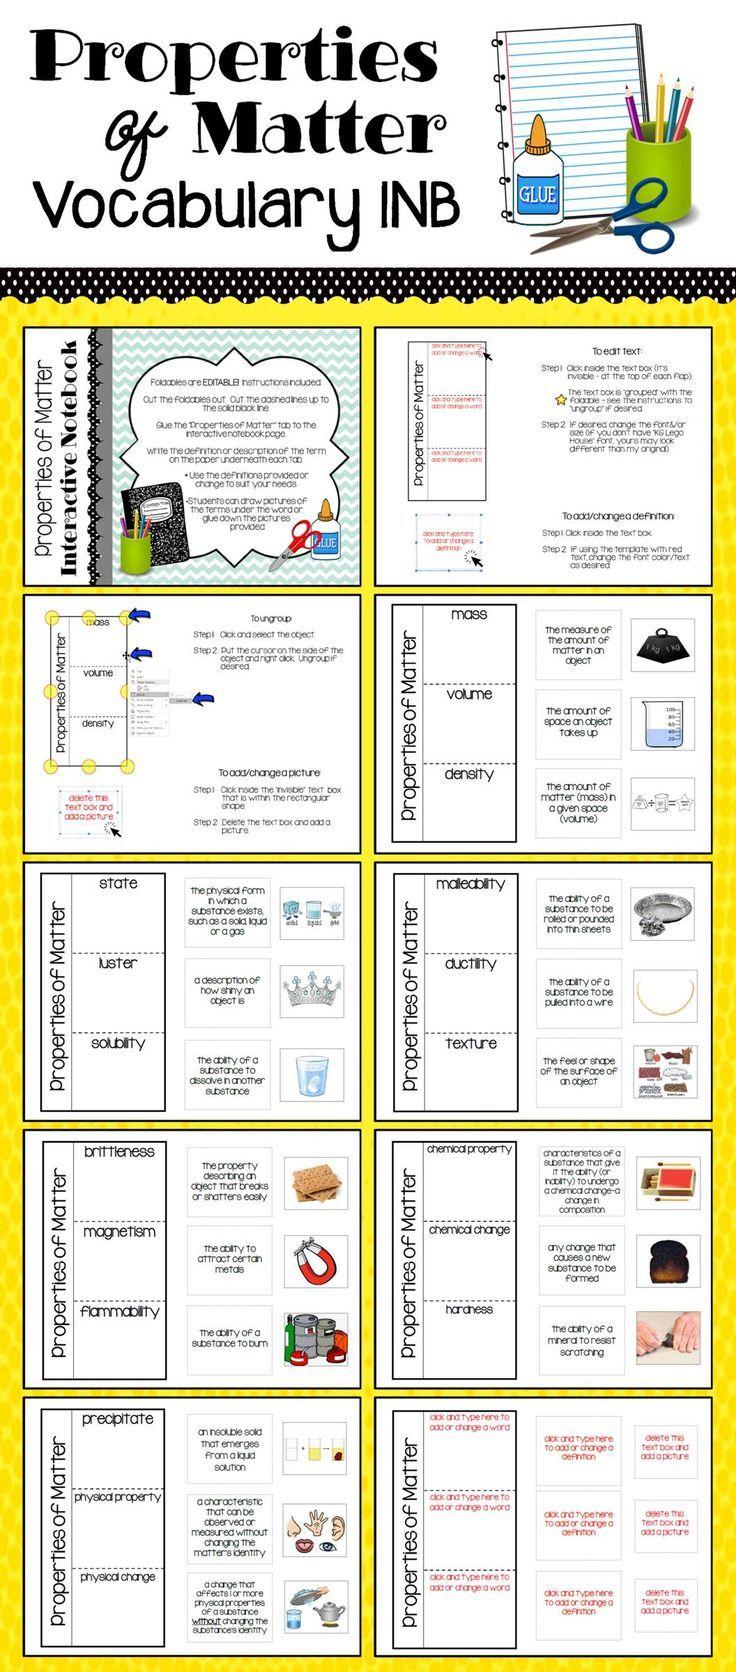 Properties Of Matter Vocabulary Interactive Notebook Activity Matter Vocabulary Vocabulary Interactive Notebook Interactive Notebooks [ 1672 x 736 Pixel ]